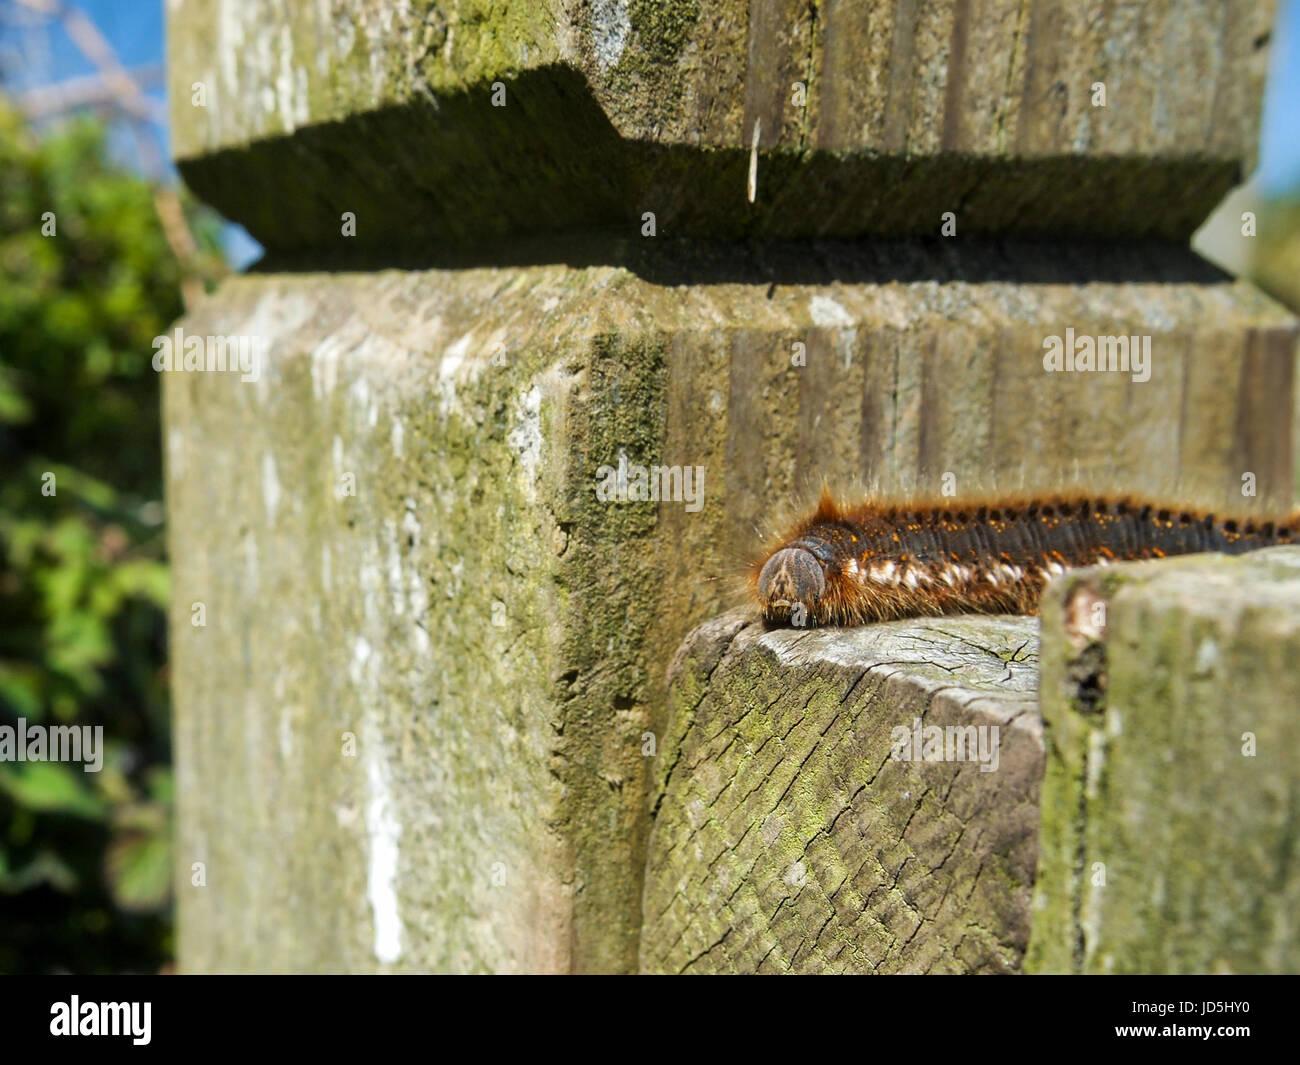 A caterpillar crawls across a fence post near Treen, Cornwall, England. - Stock Image